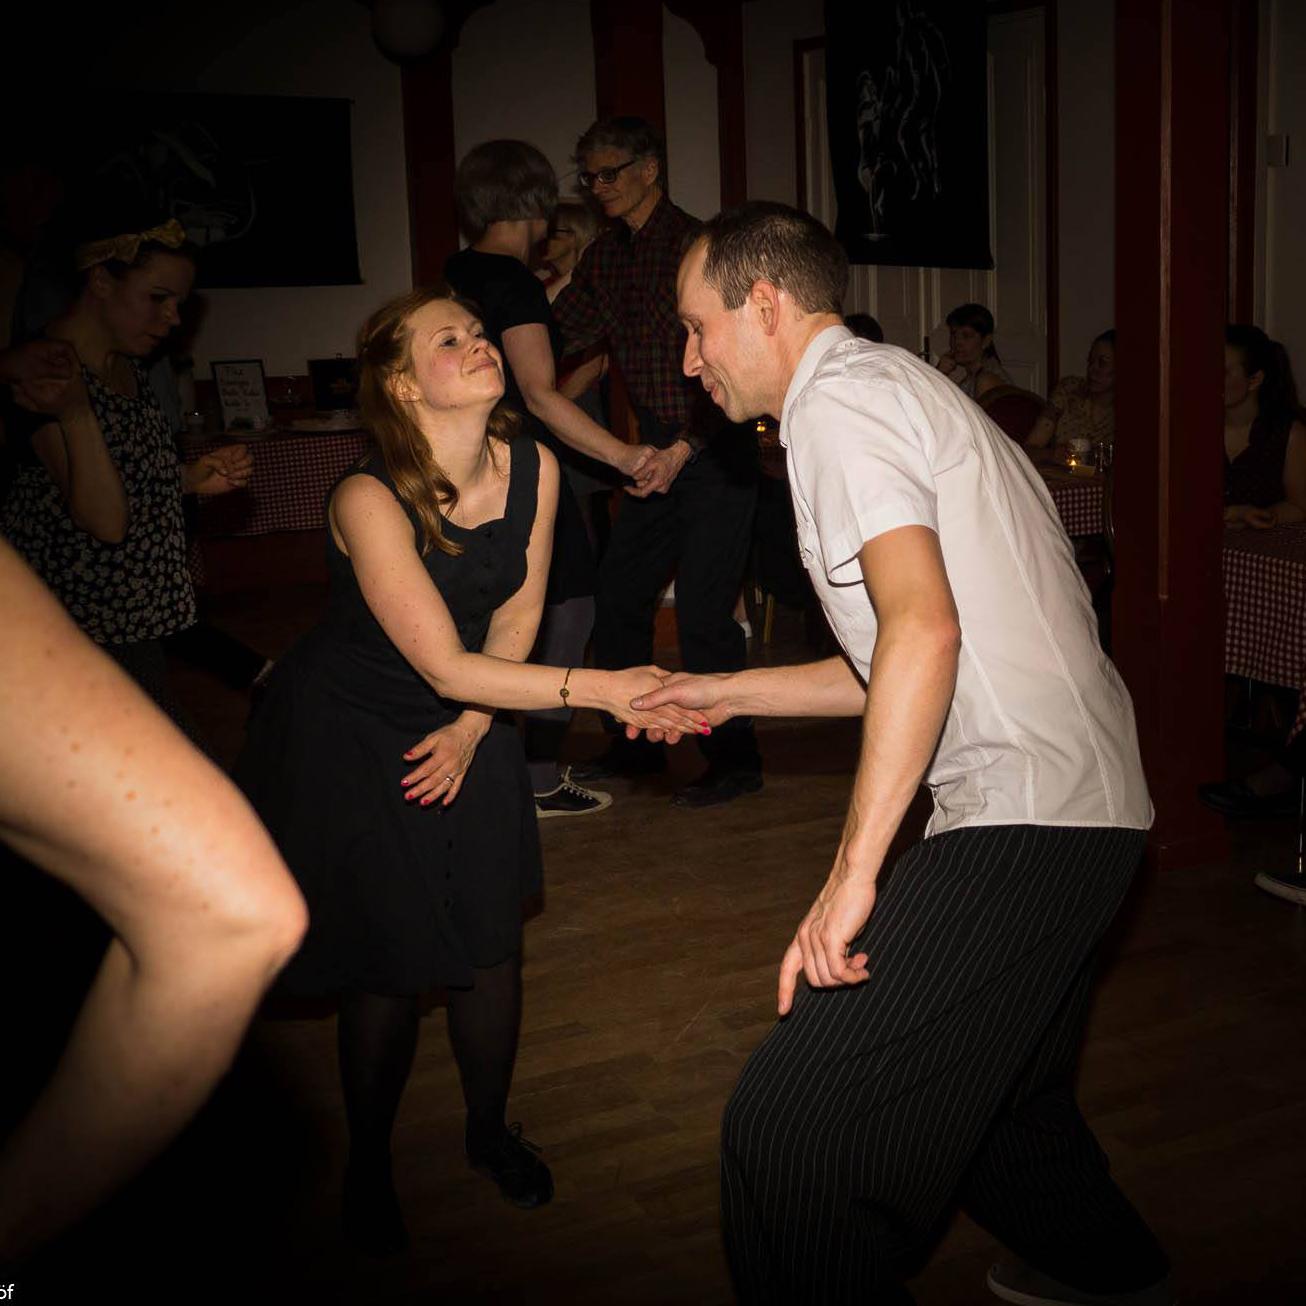 träffa oskuld dansa i Umeå